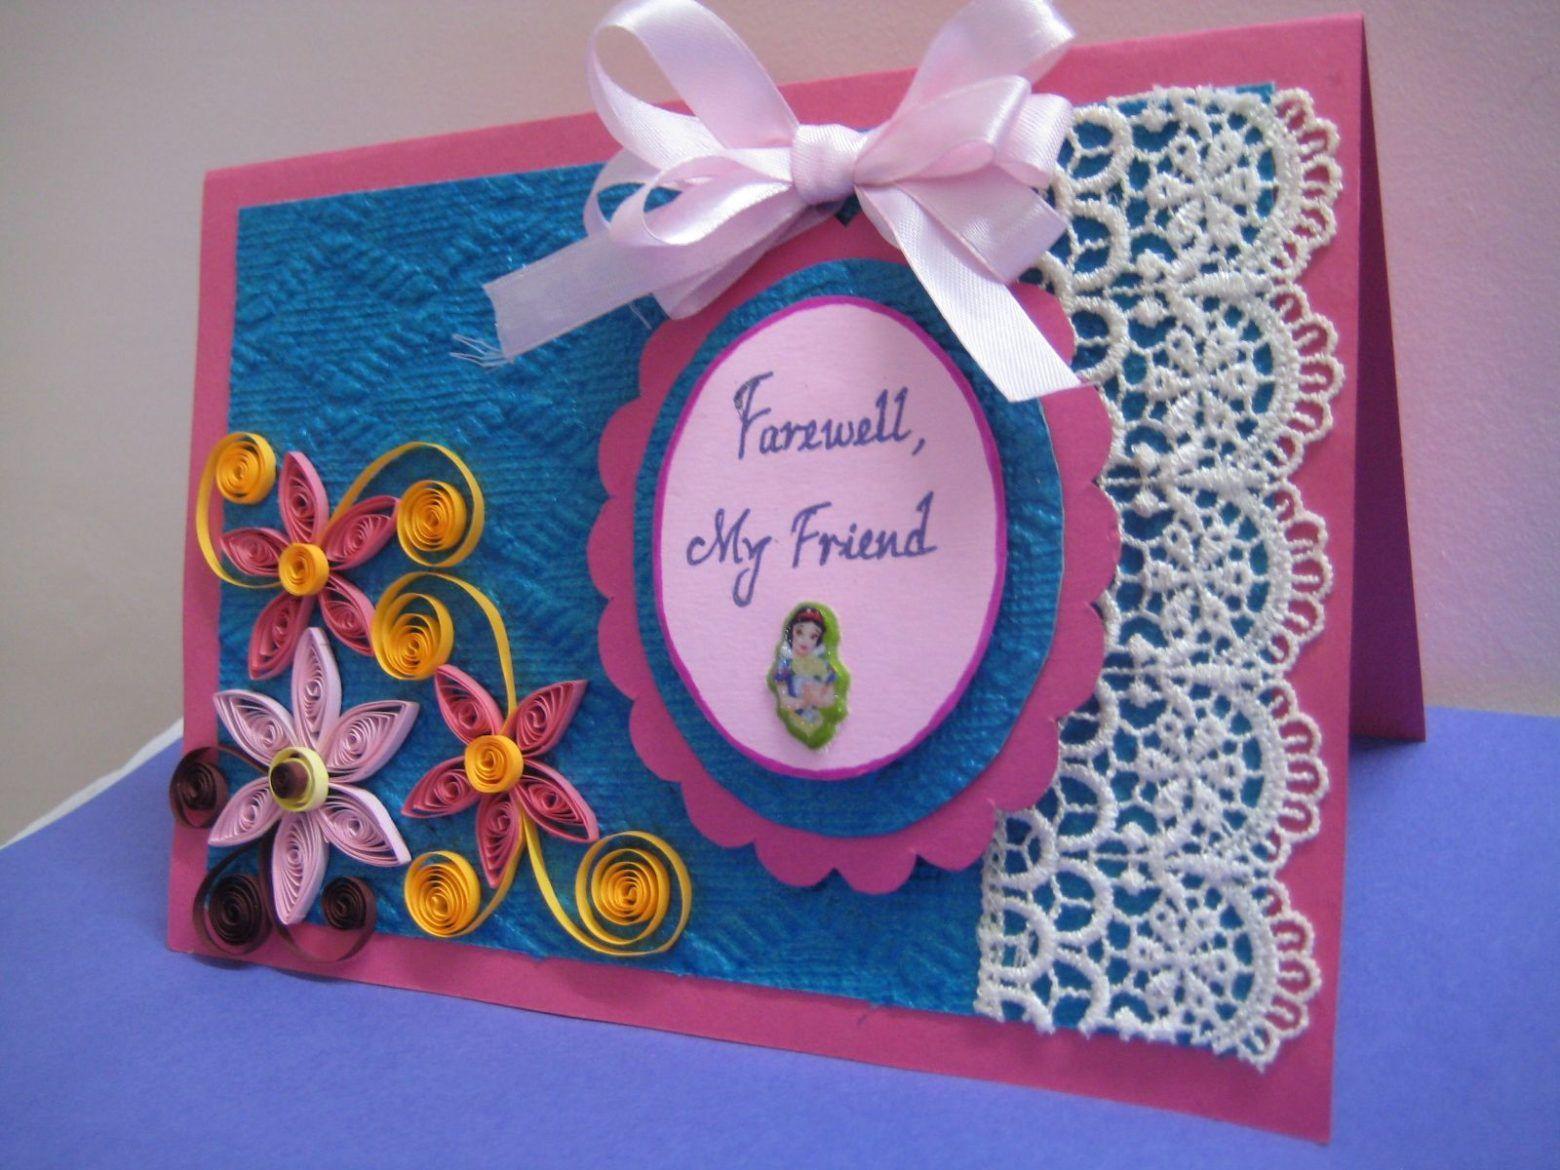 8 New Ideas Make A Farewell Card Card Design Handmade Handmade Invitation Cards Cards Handmade